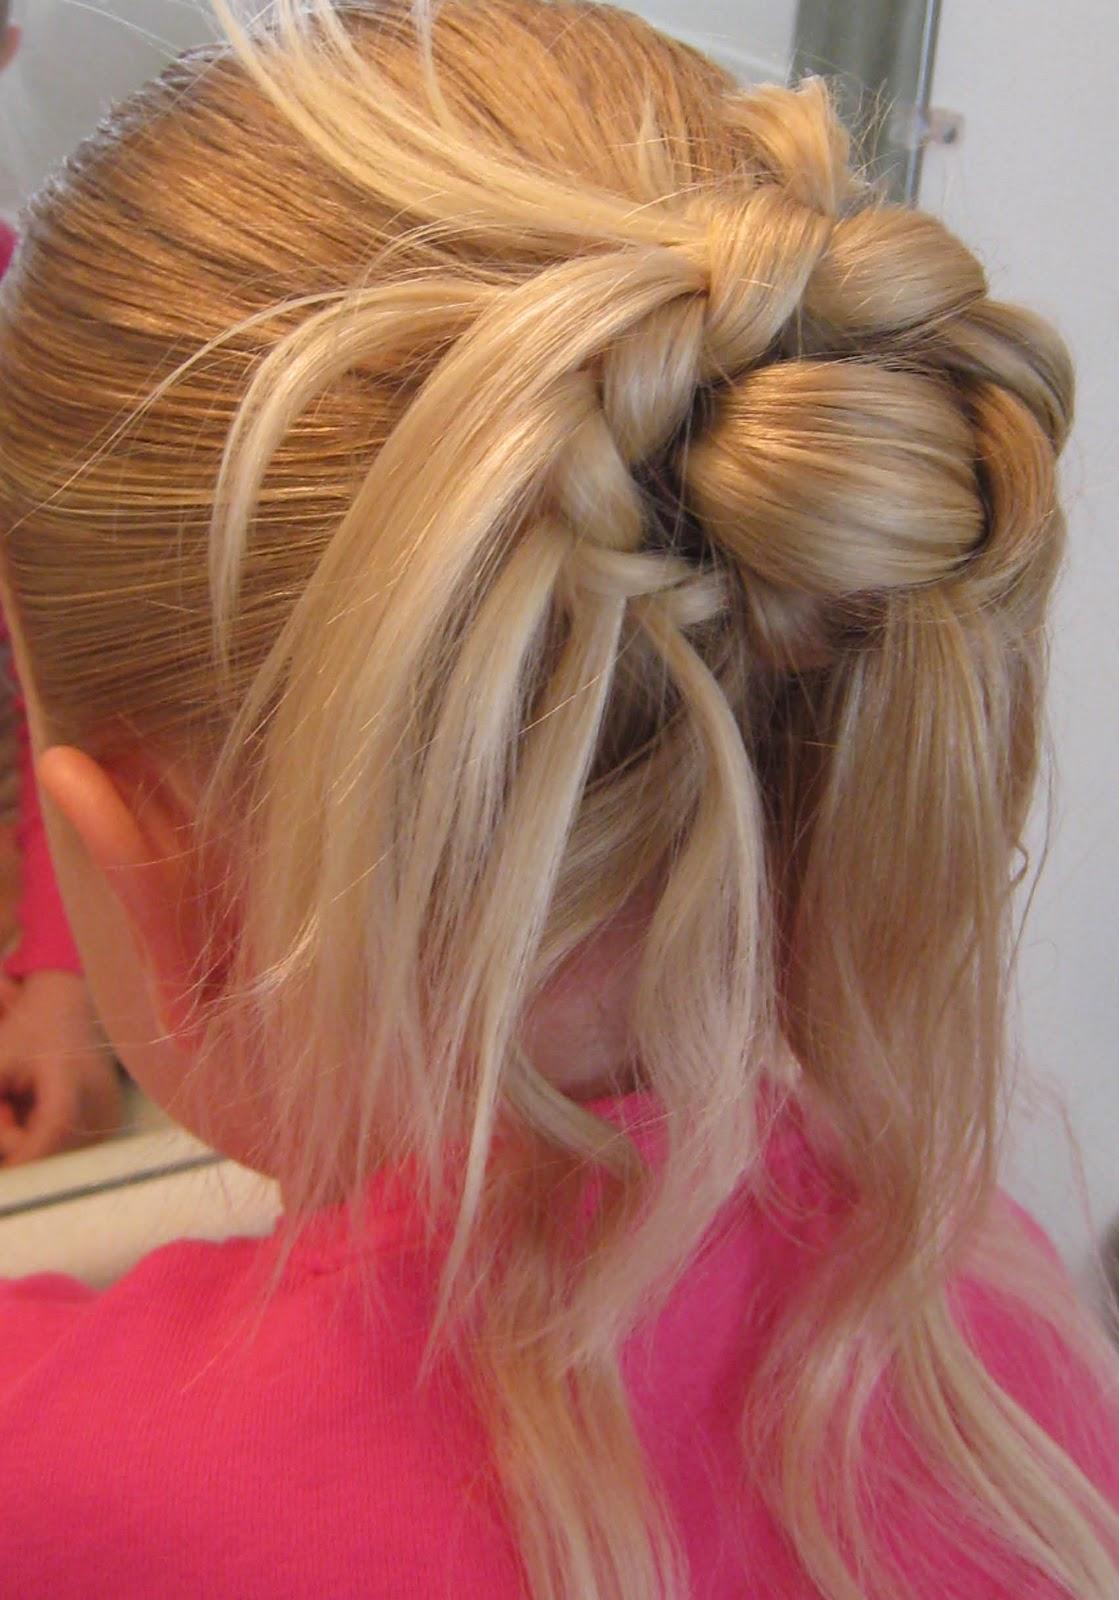 Only Women Secrets 10 Stunning Braided Bun Hairstyles